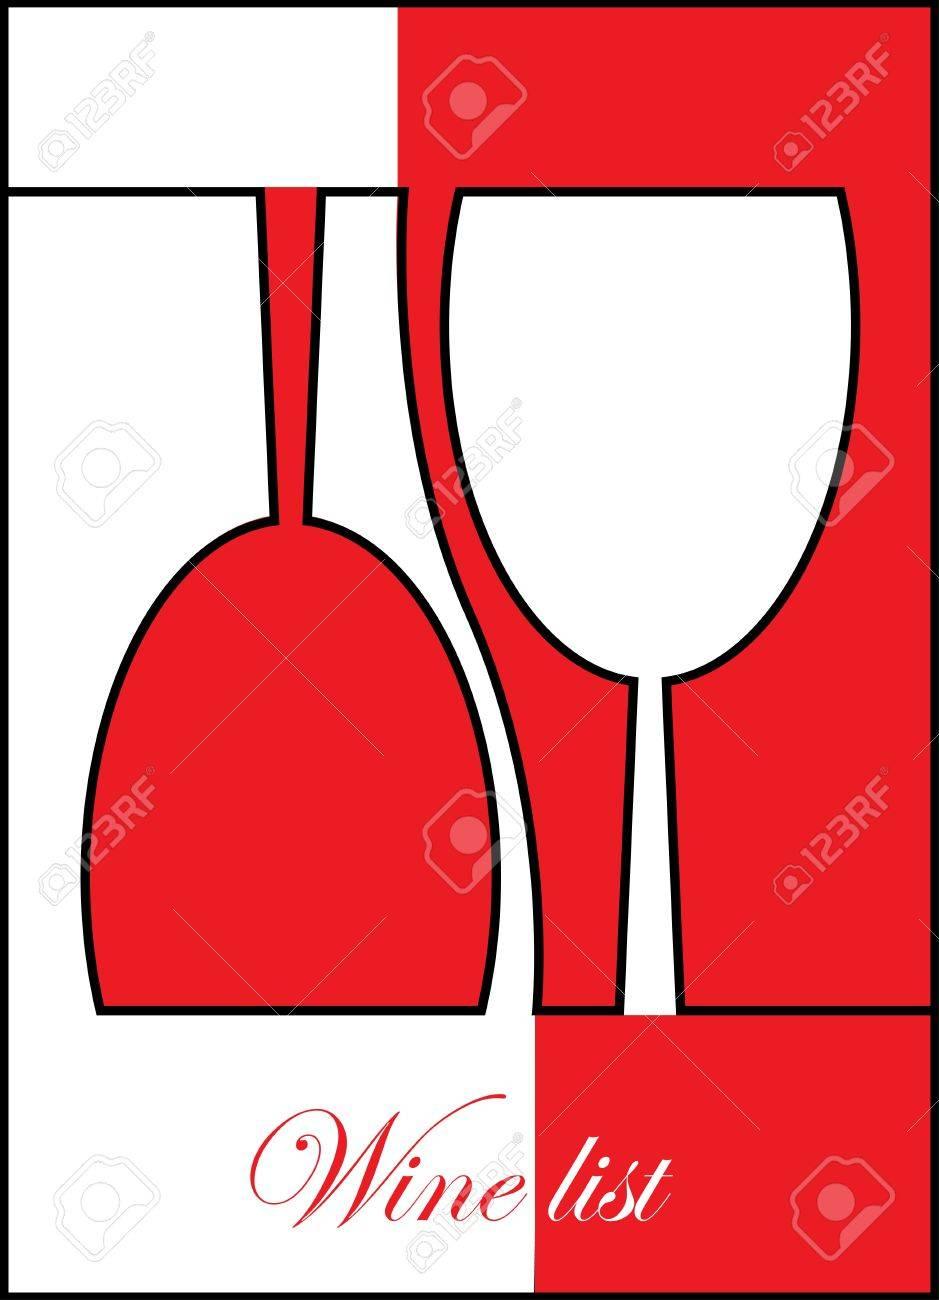 wine list design Stock Vector - 12949910